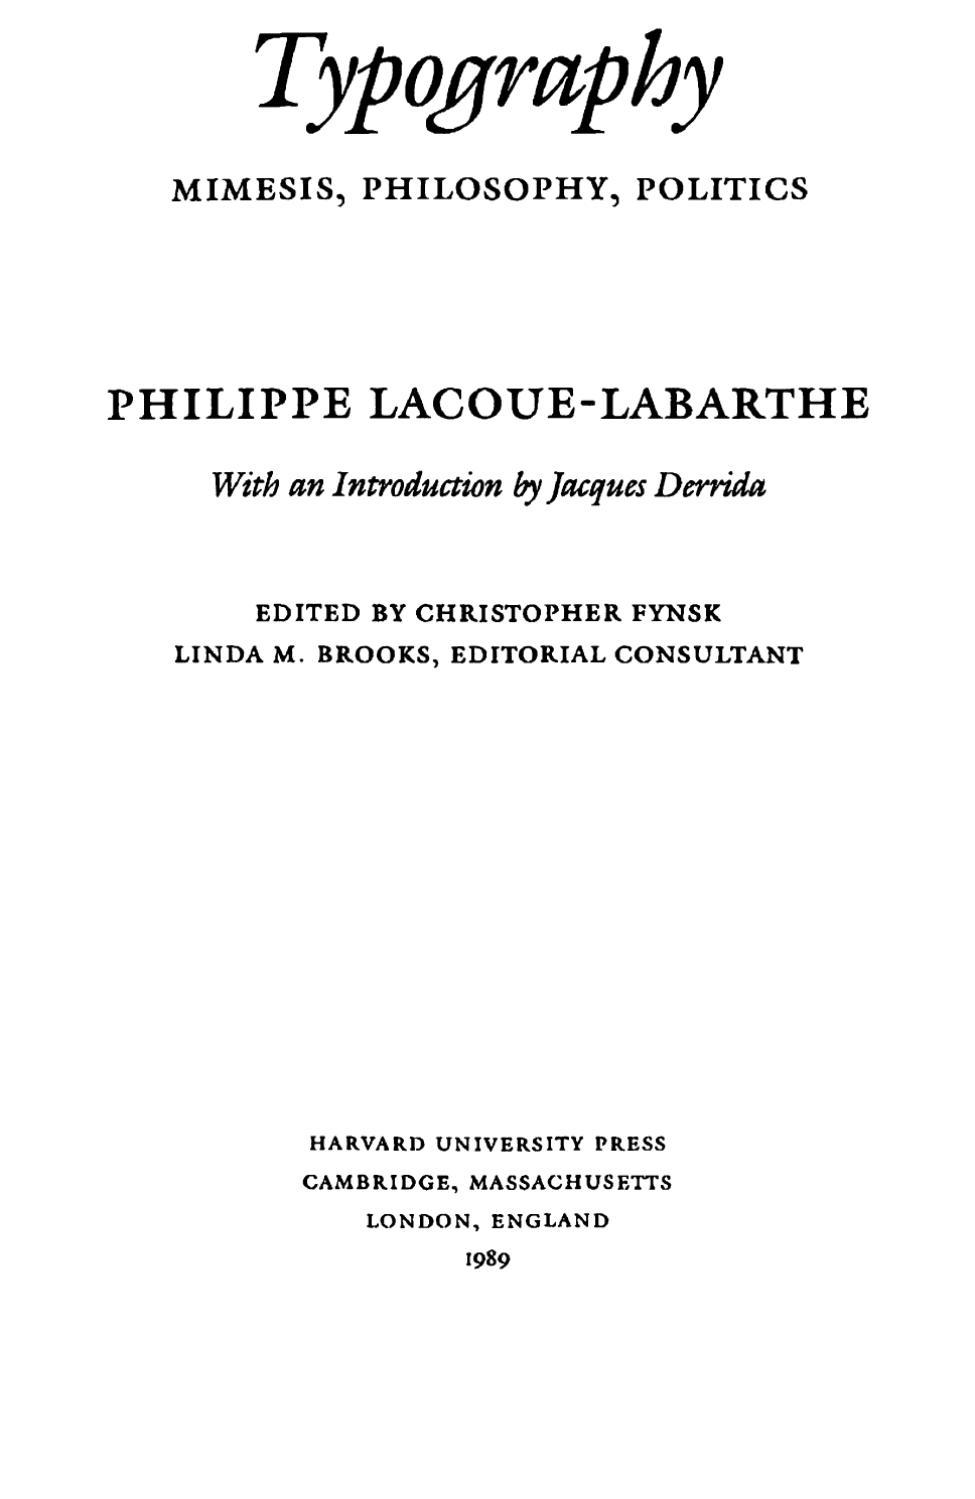 Typography Mimesis Philosophy Politics By Ivan Radenkovic